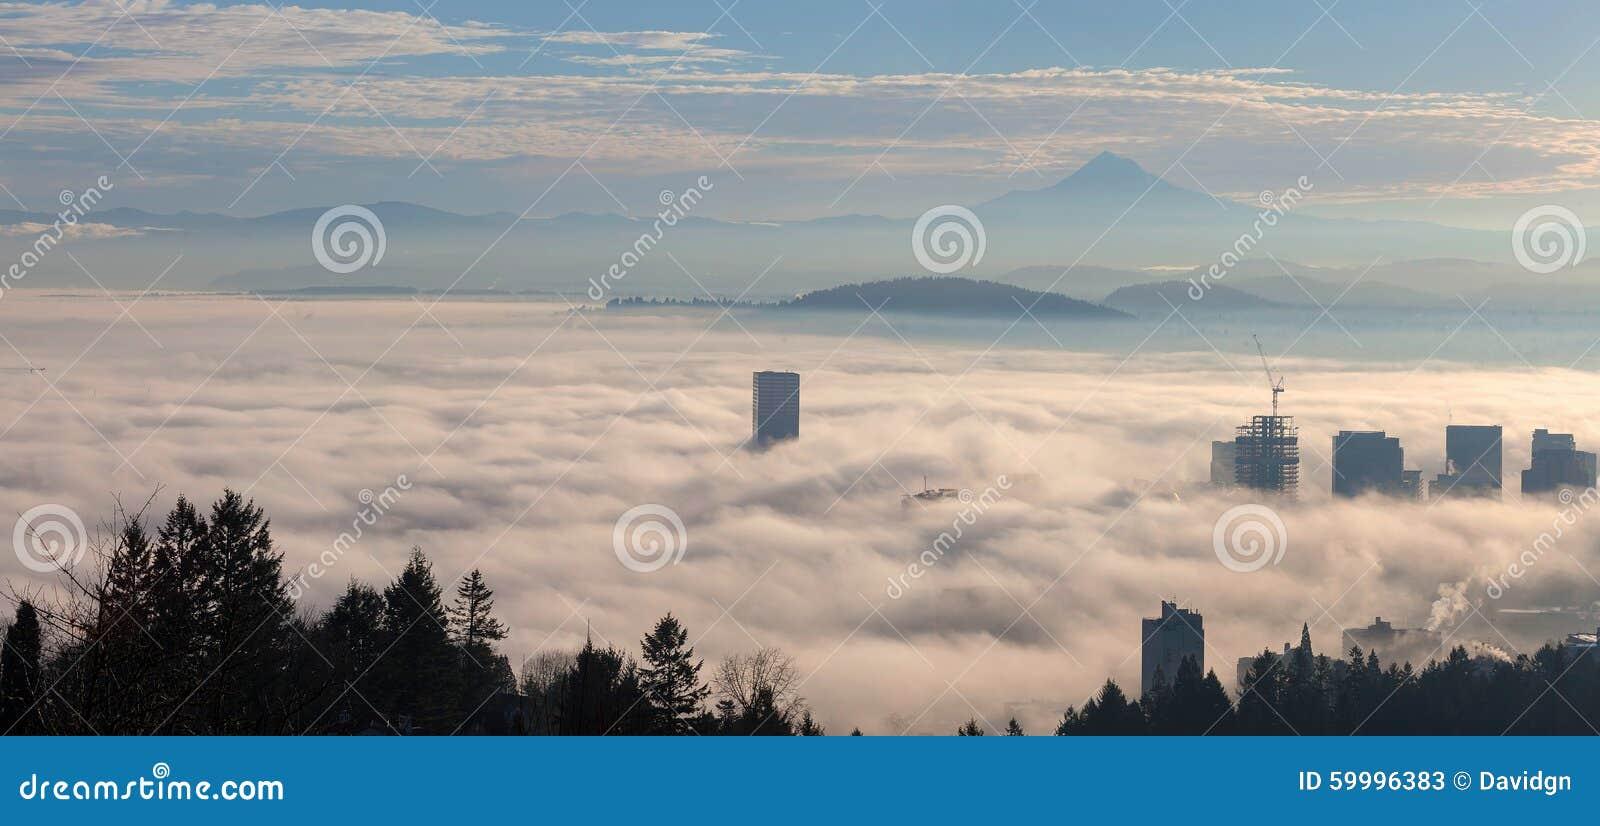 Paysage urbain de Portland couvert en brouillard de matin